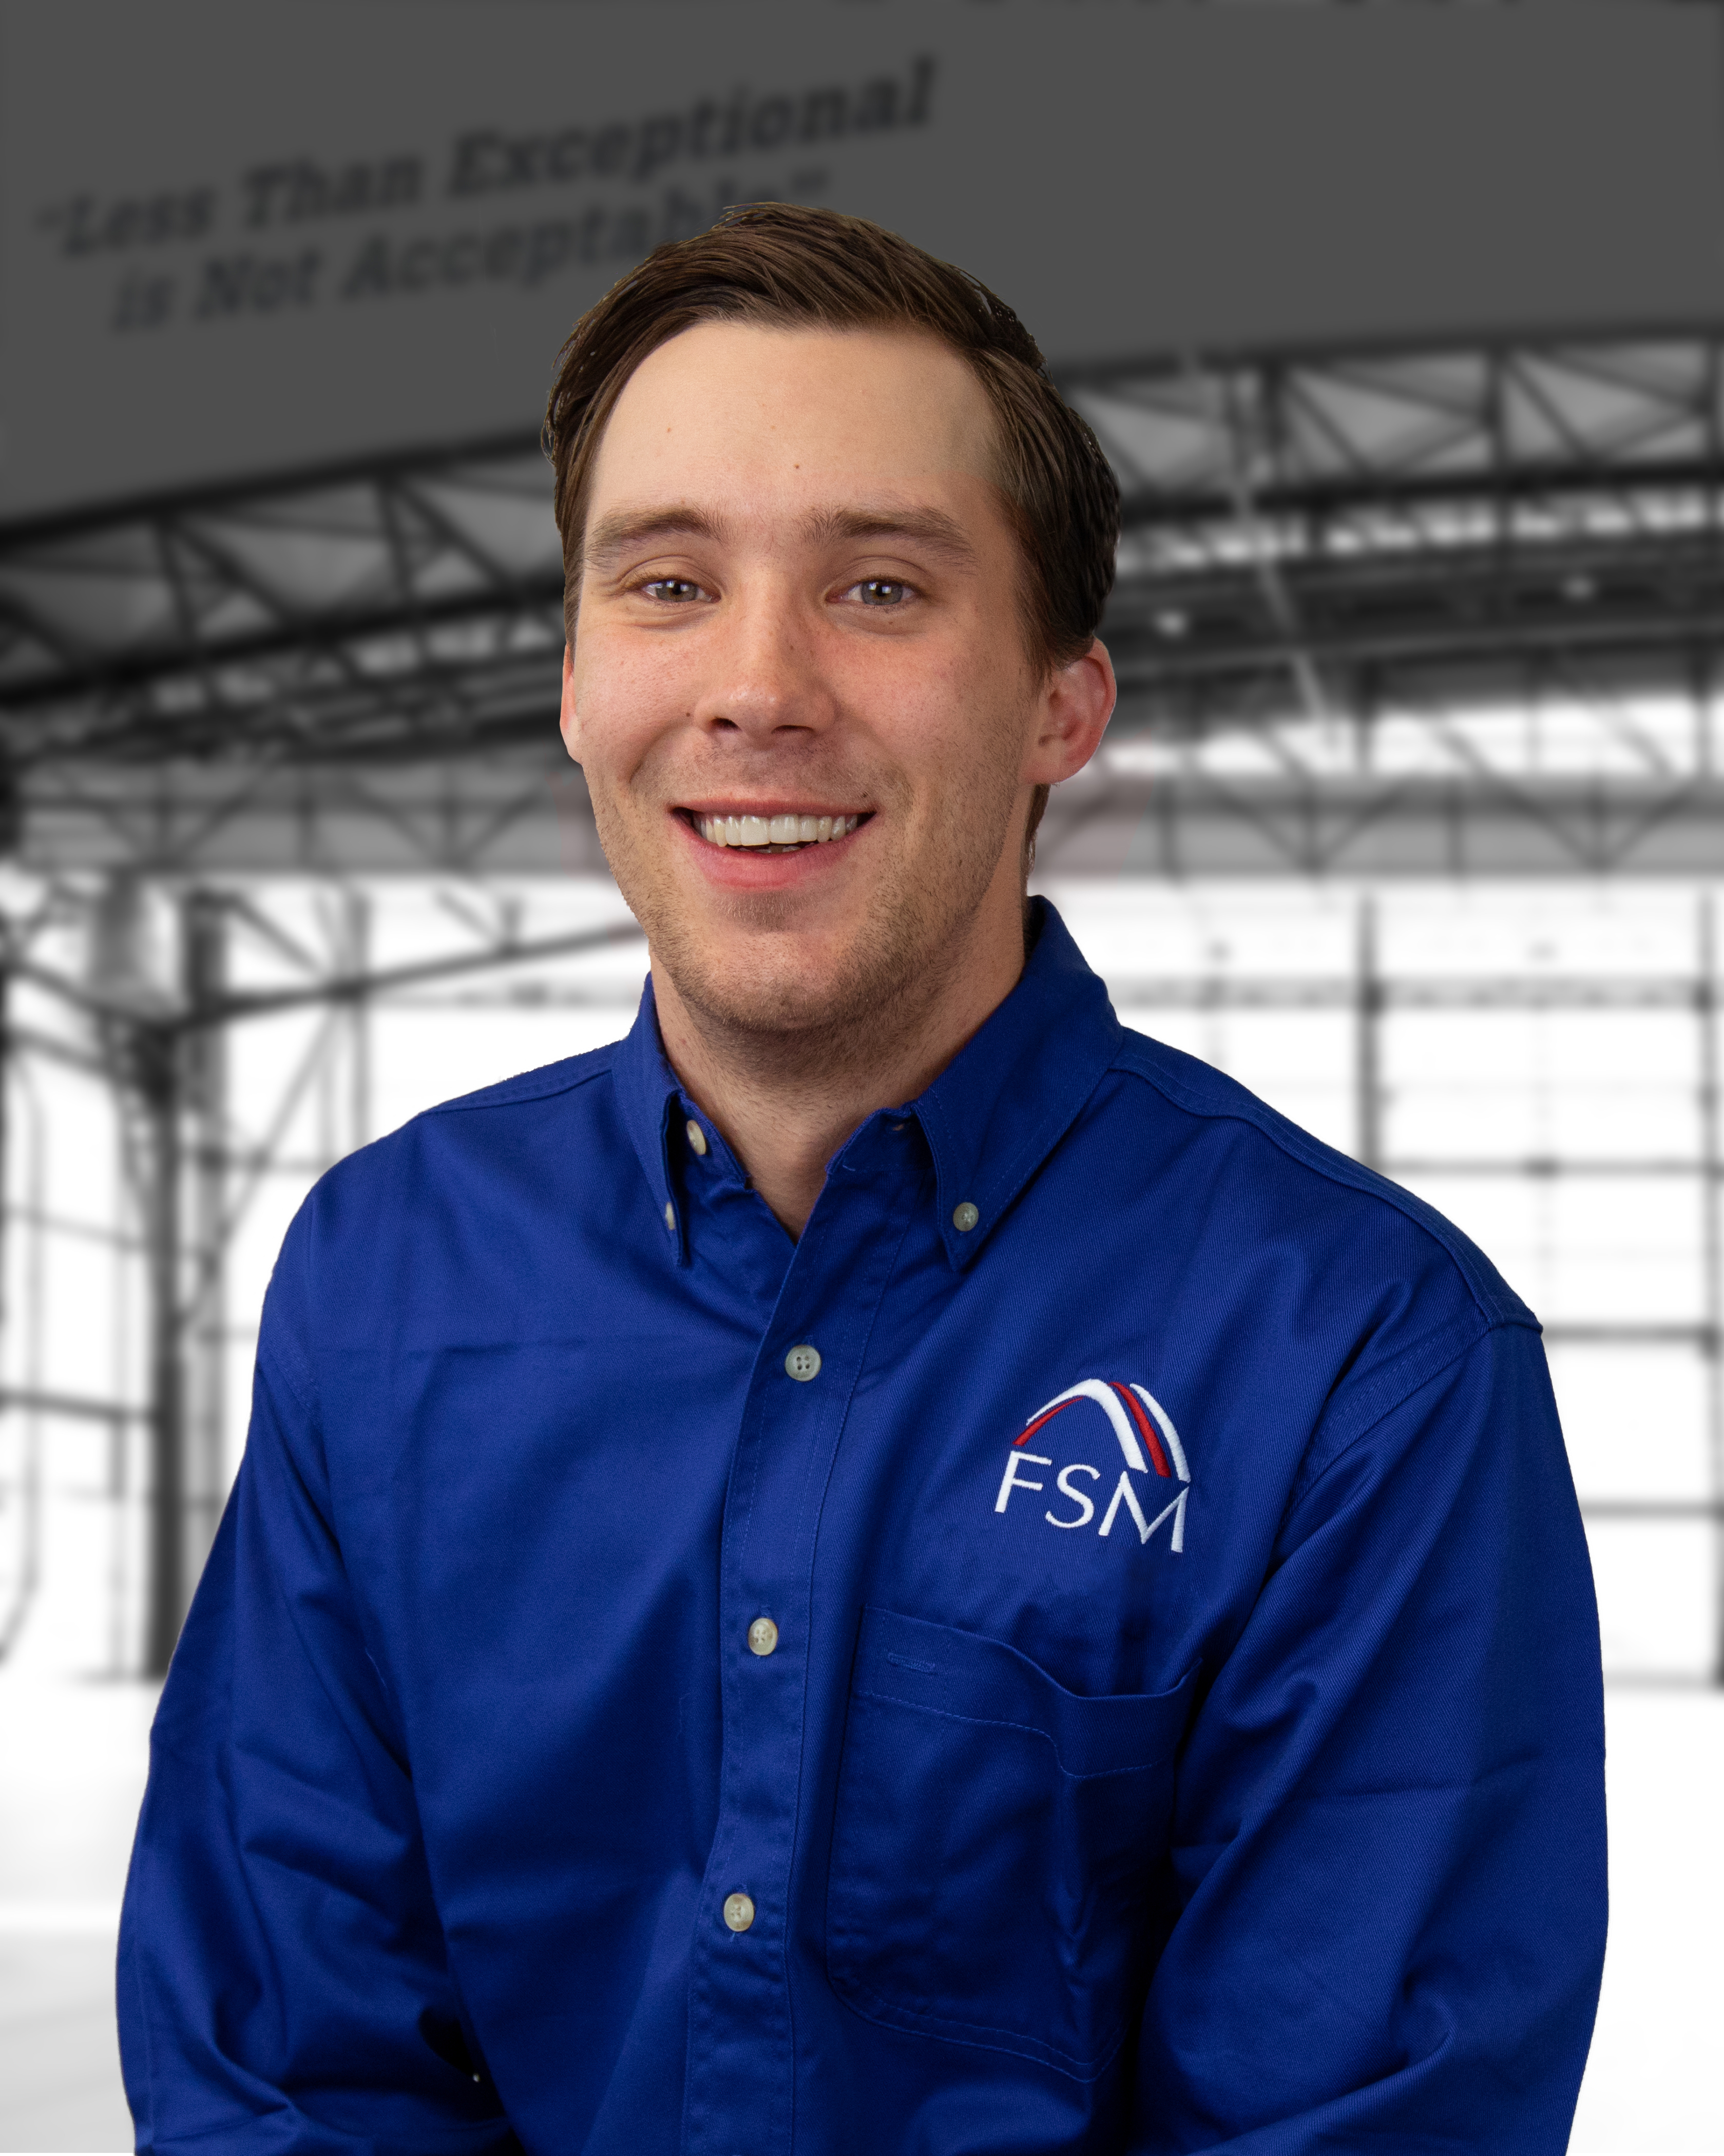 FSM Jacob Lemasters Foreman